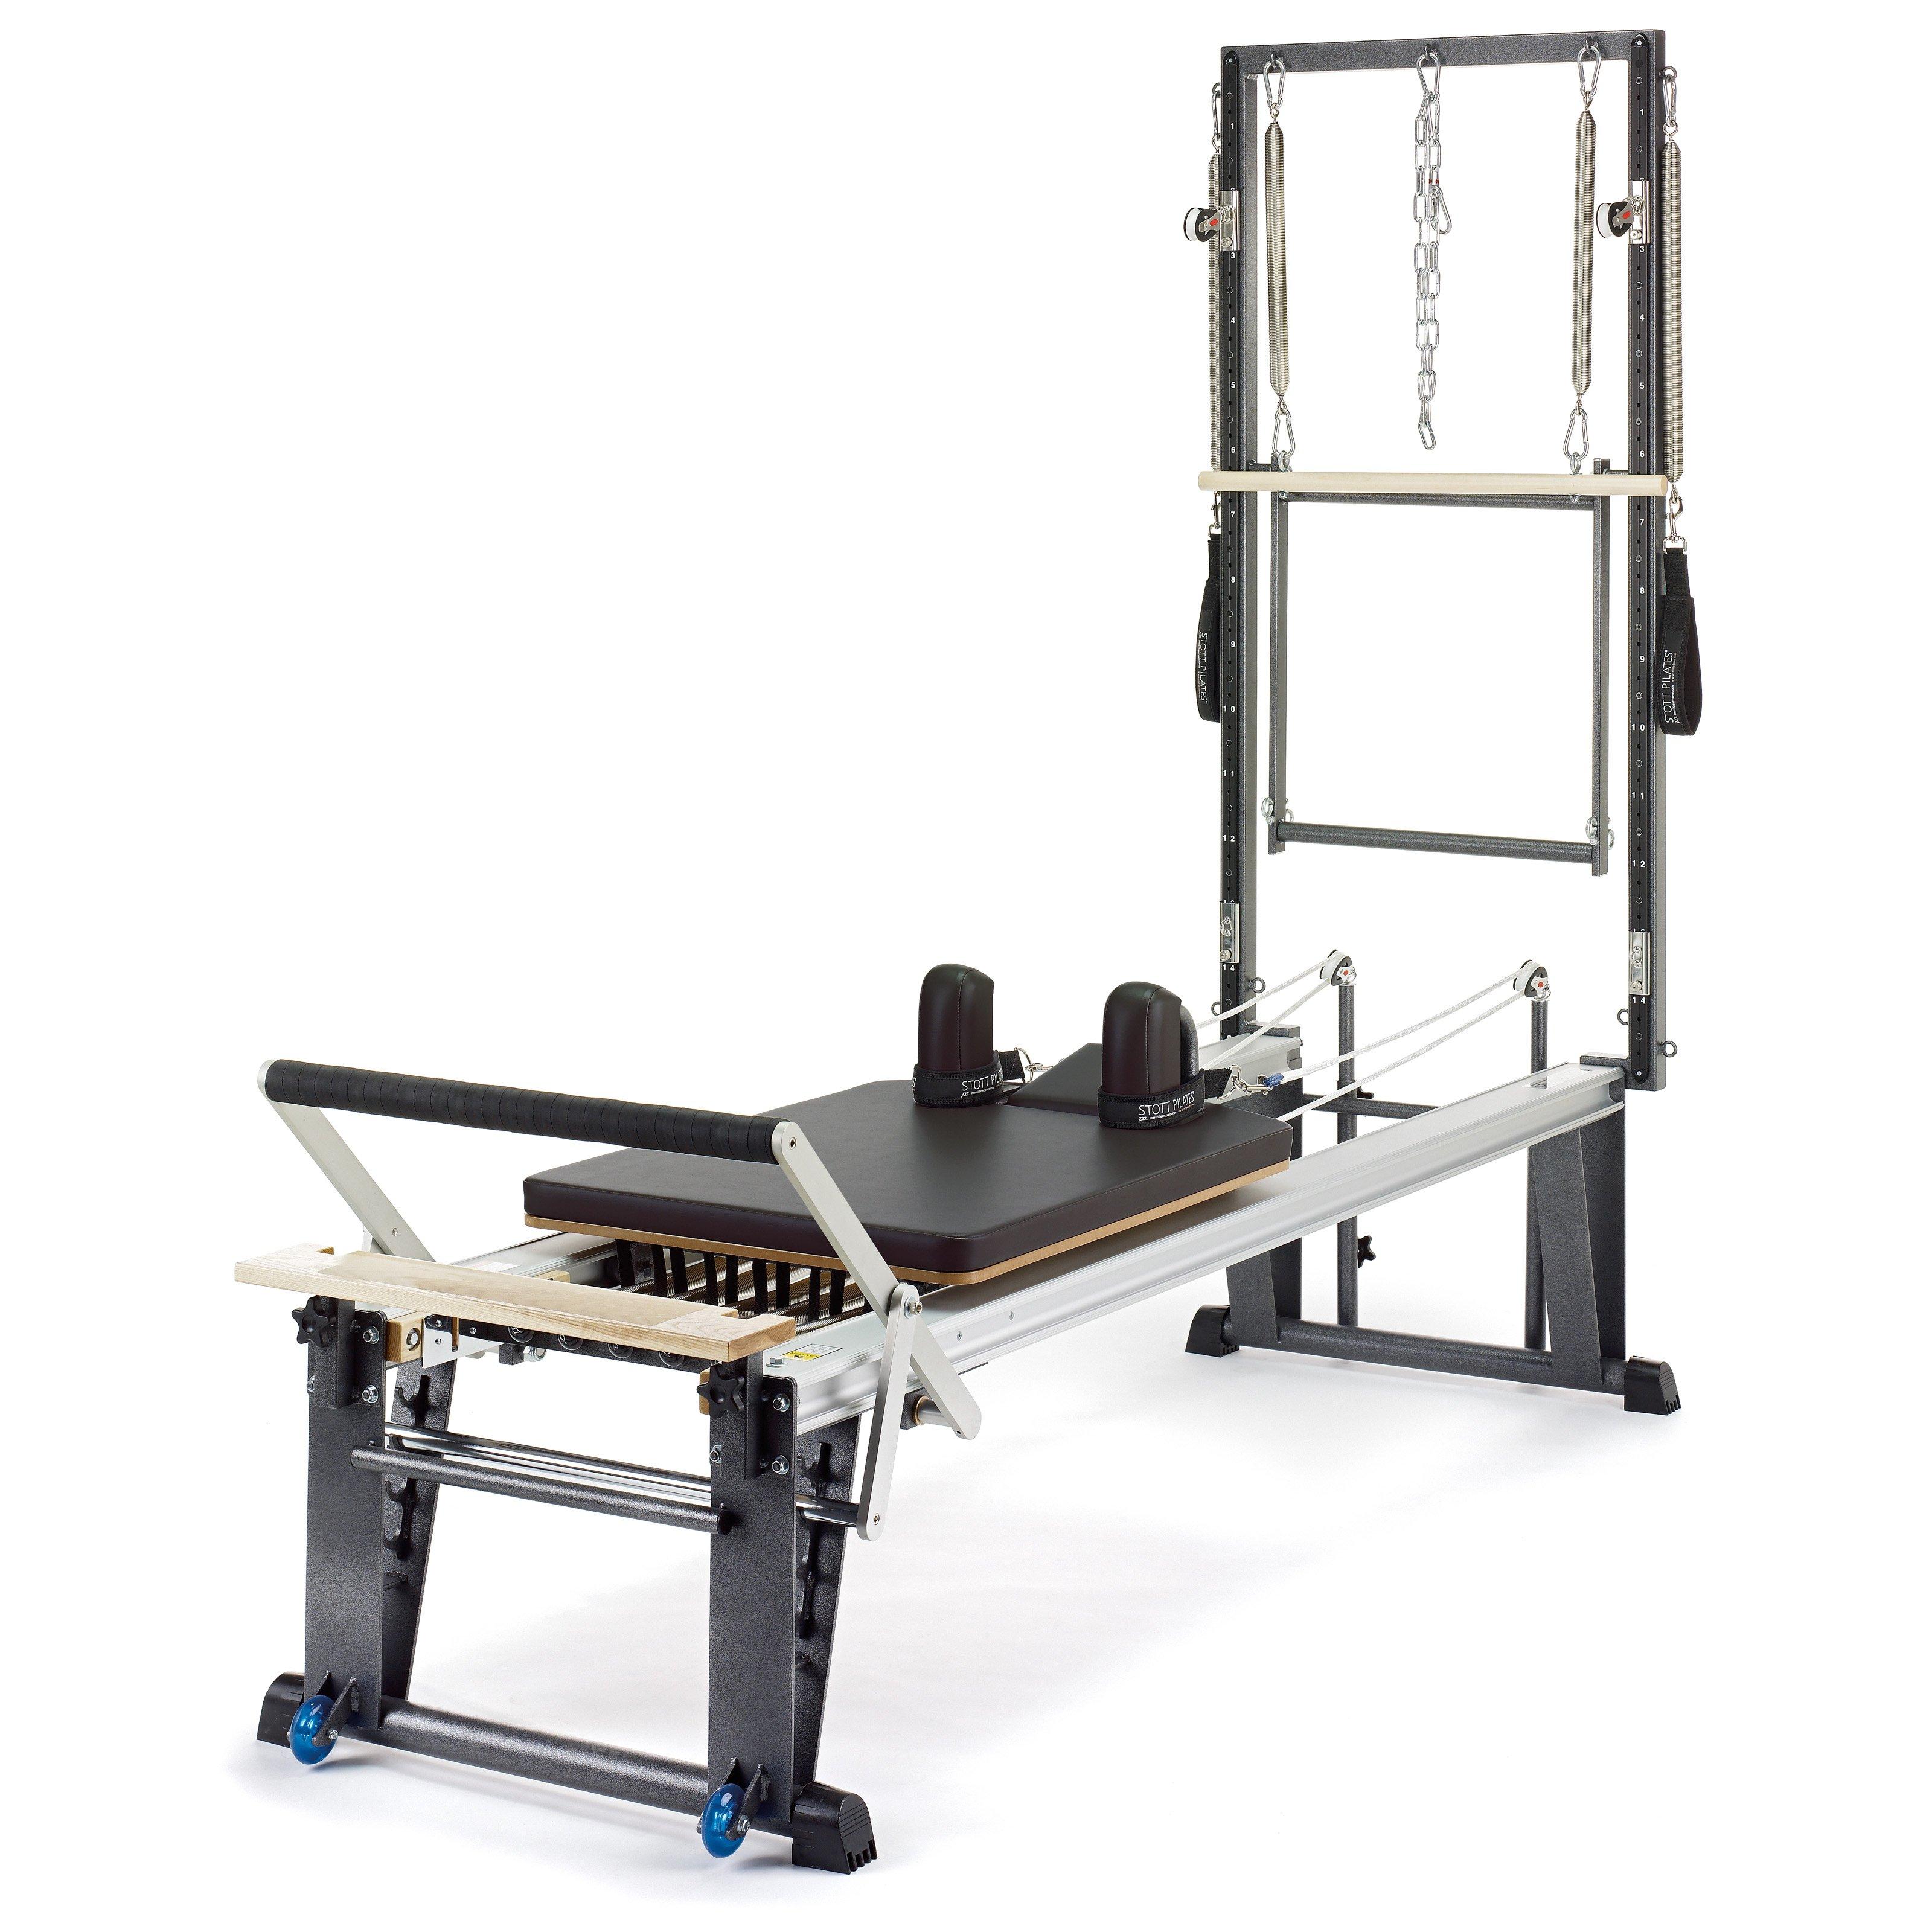 Stott Pilates Merrithew V2 Max Plus Rehab Reformer, Brown